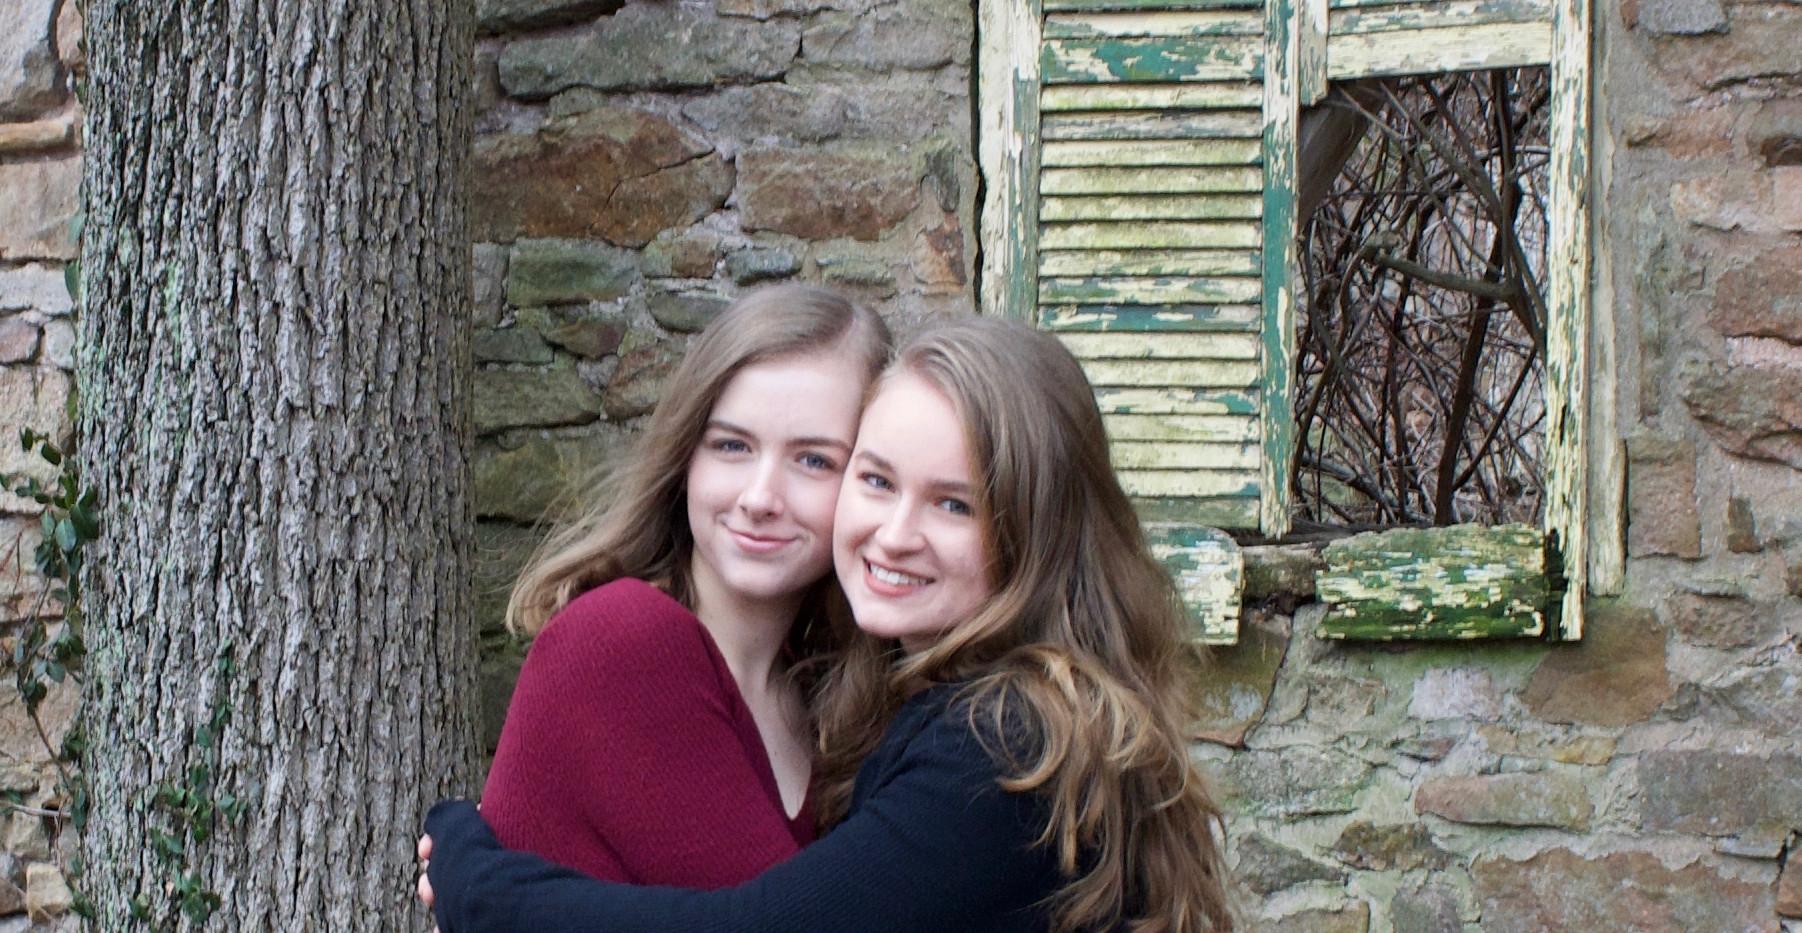 Sister Photo Shoot